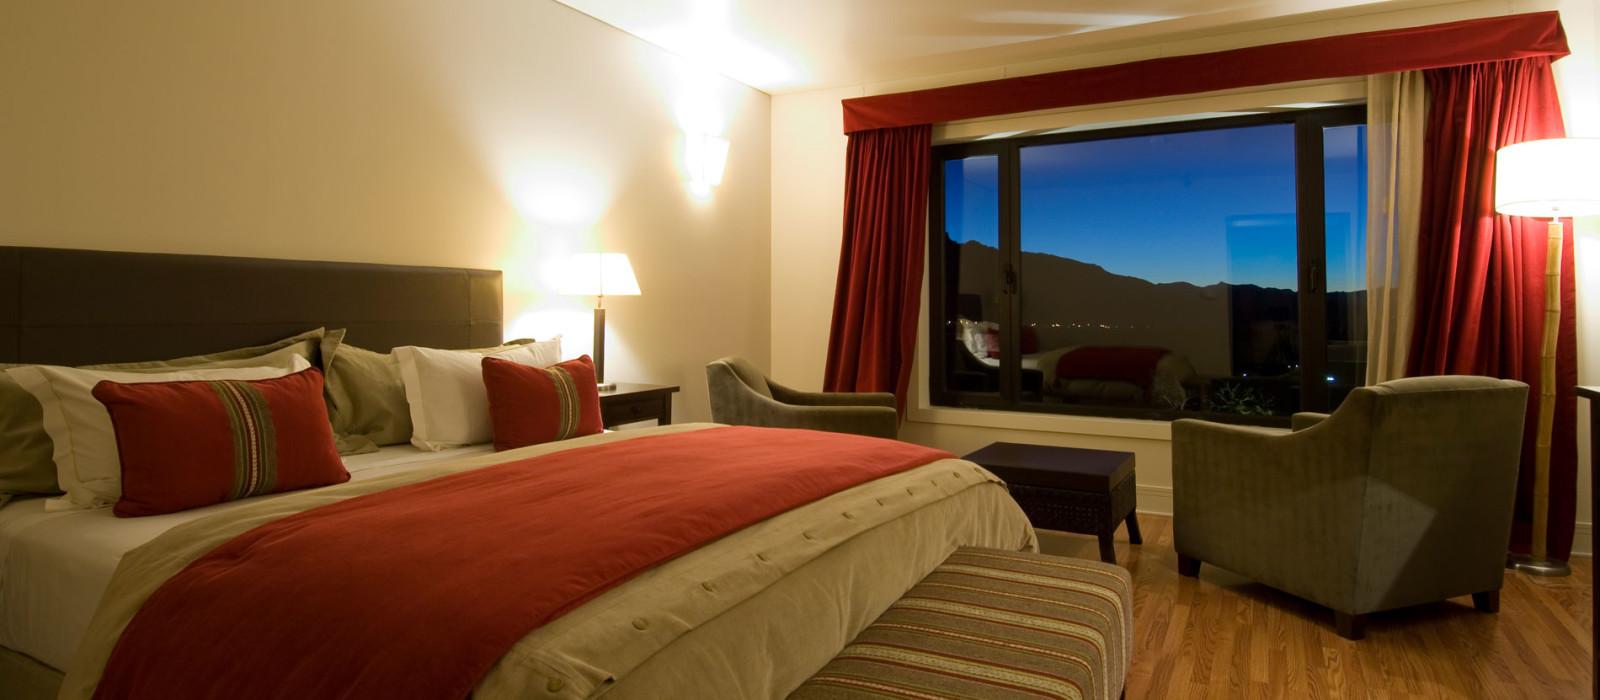 Hotel Loi Suites Chapelco  Argentinien